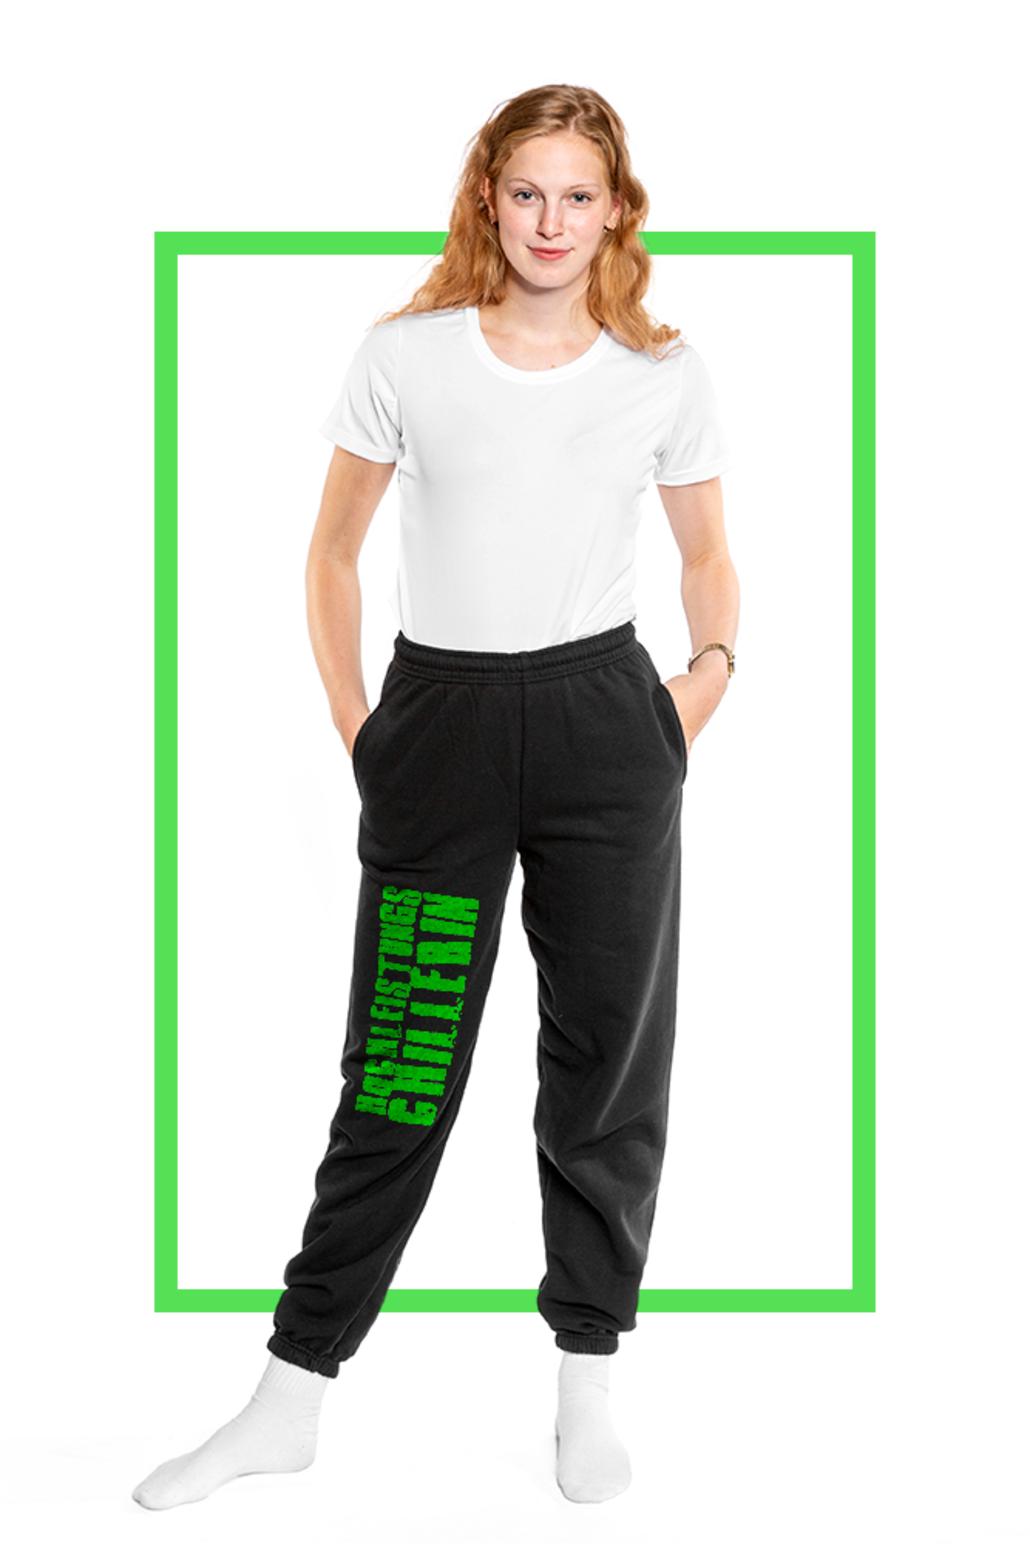 Frau mit selbst gestalteter Jogginghose